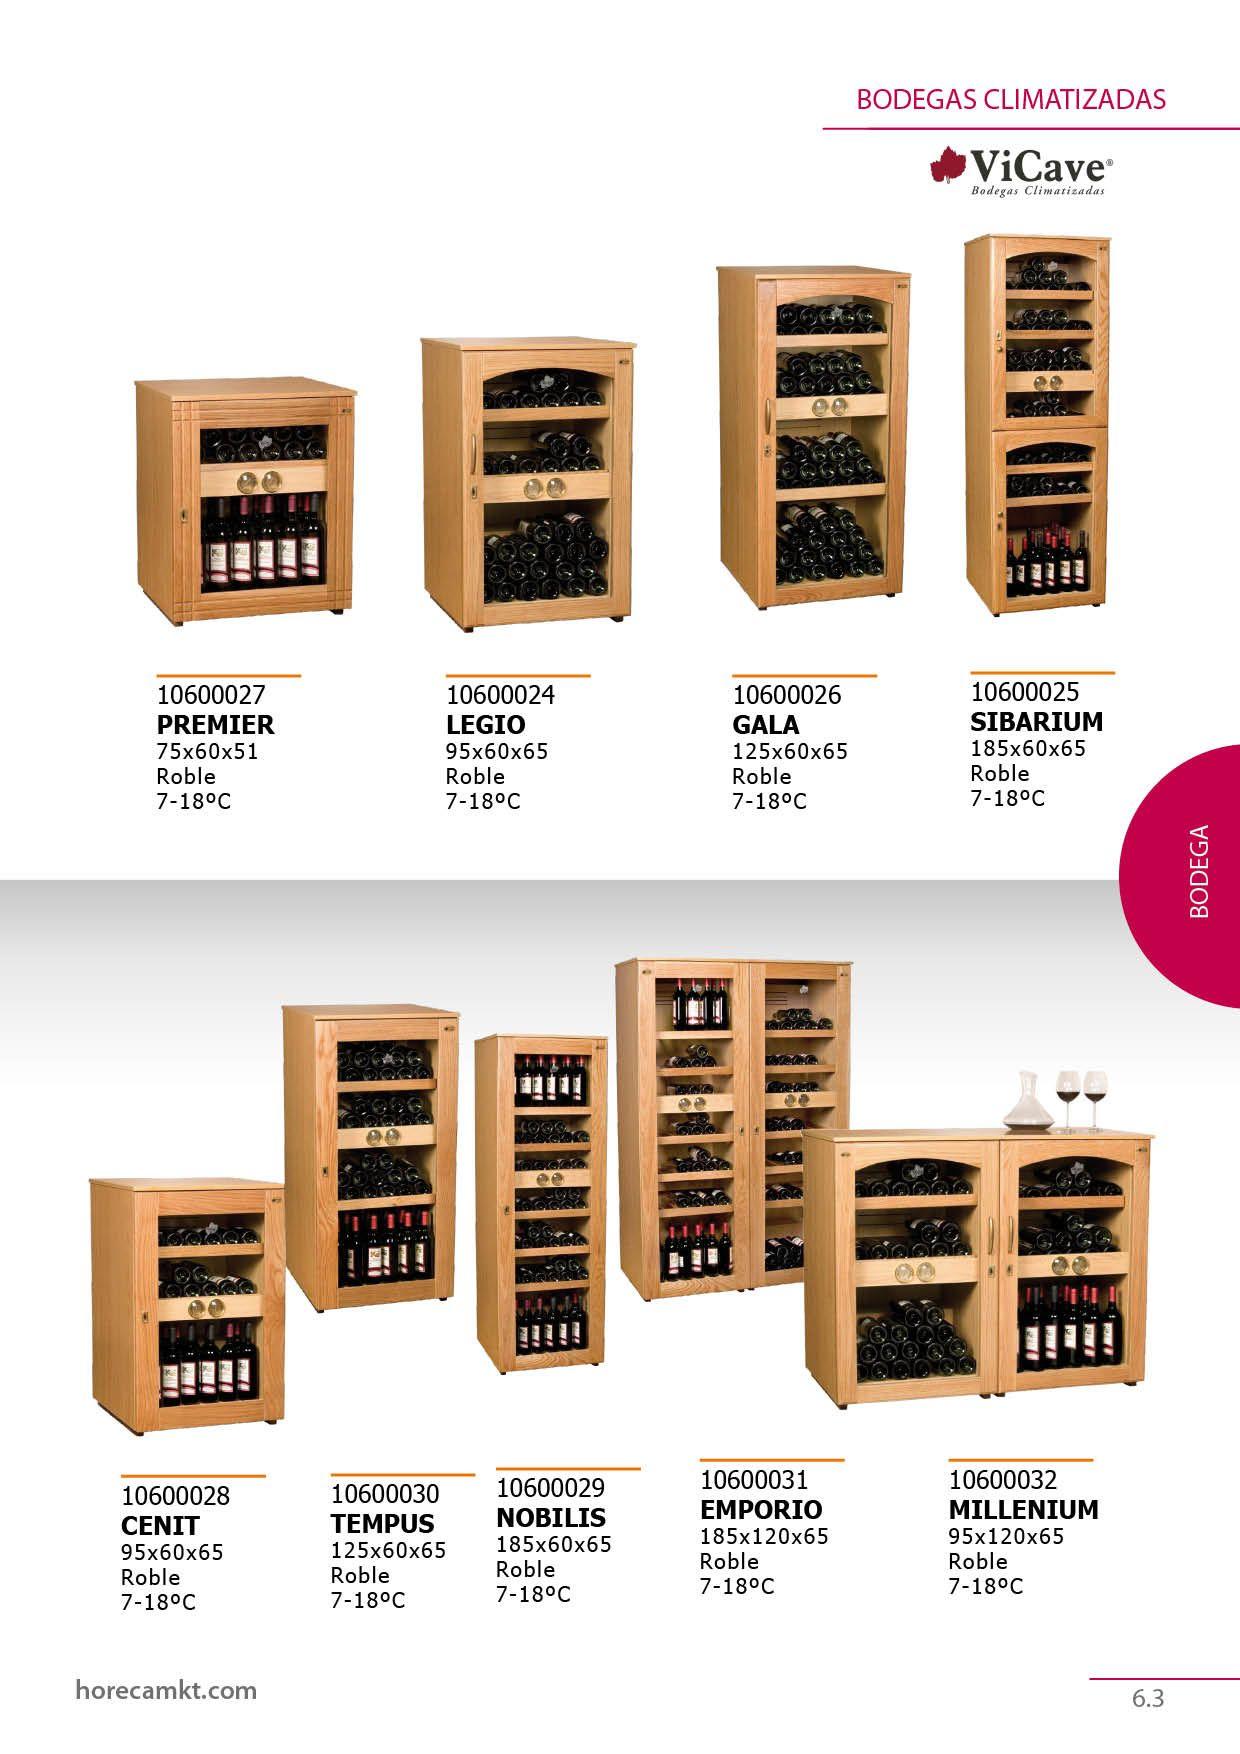 Bodegas climatizadas para bebidas de VICAVE. Especial vinos.